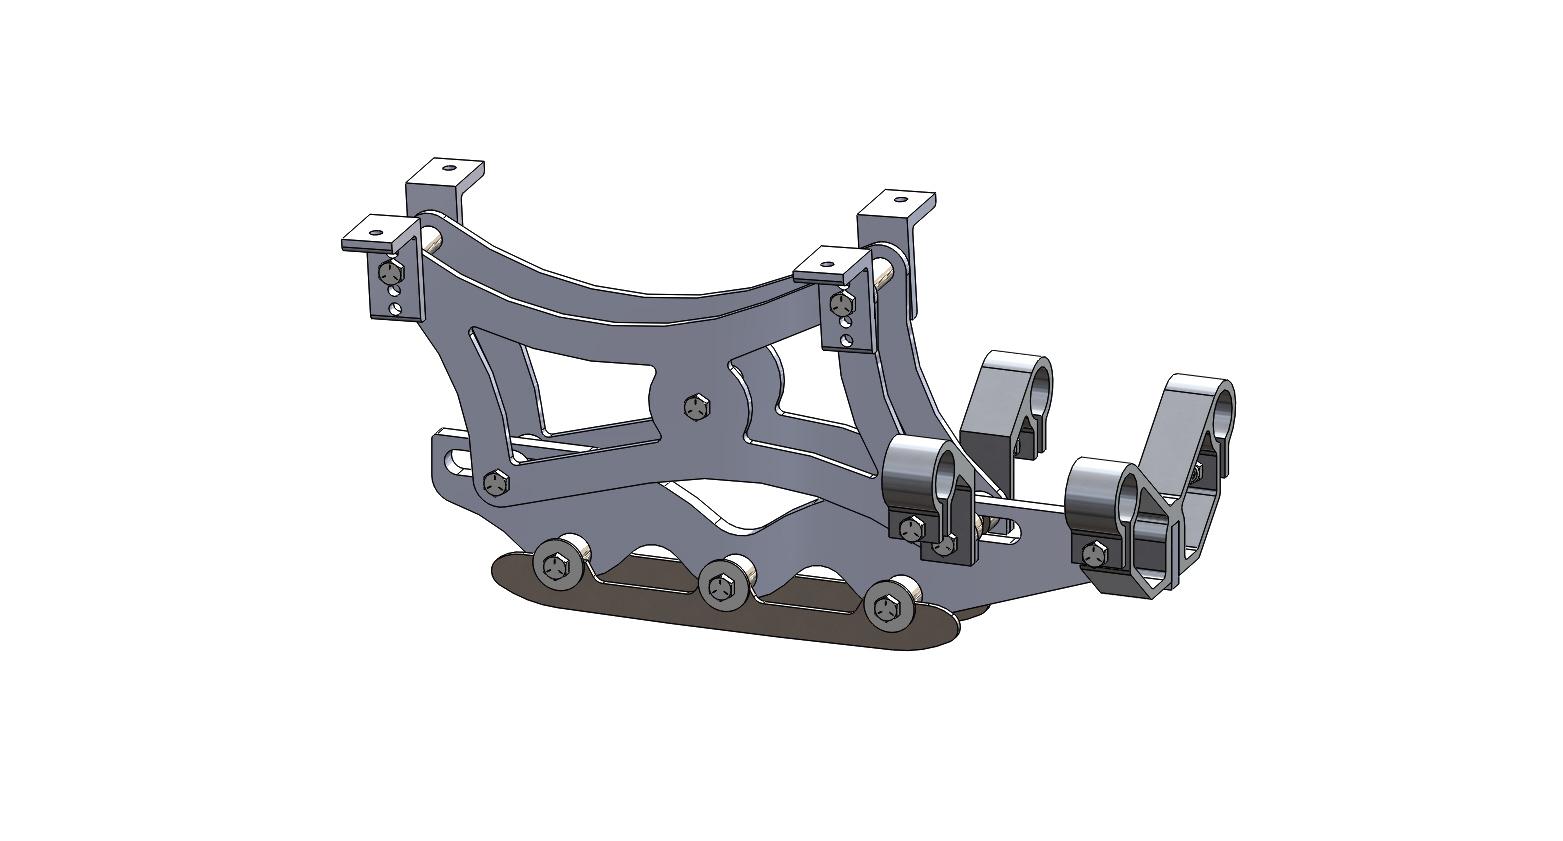 Wave Rear Frame Assembly 7 inch riser short blade